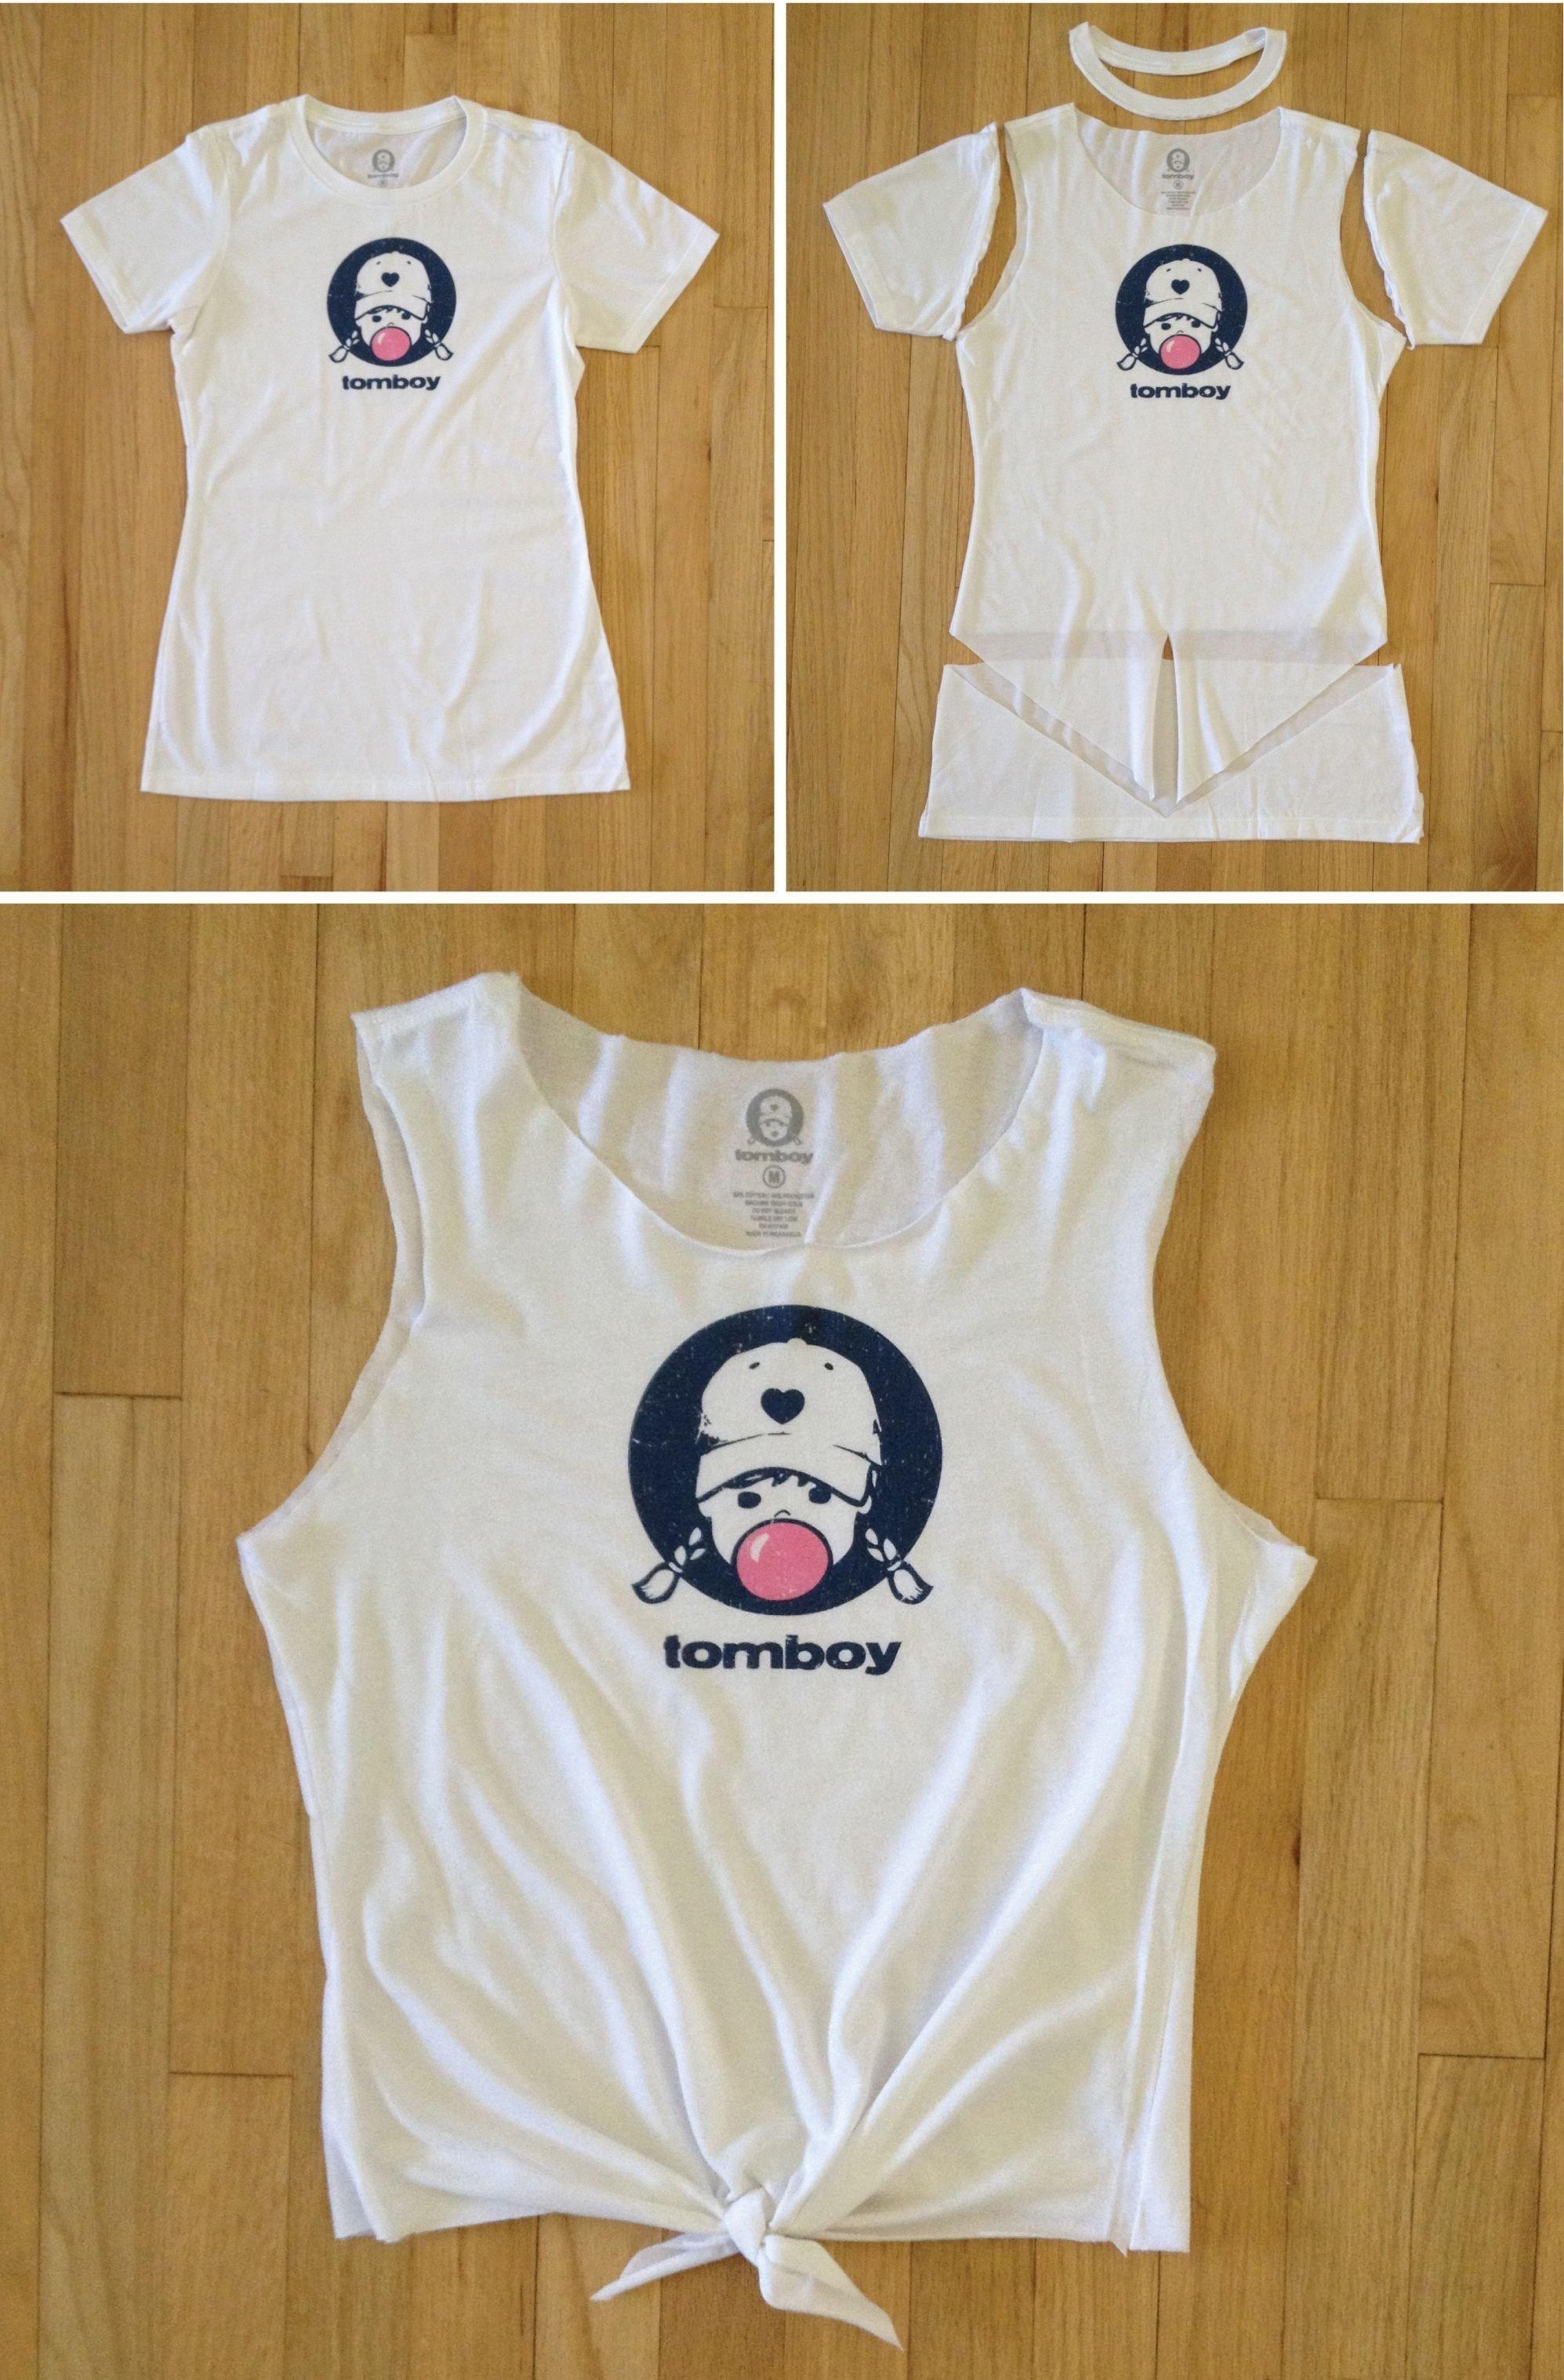 10 Attractive Cool T Shirt Cutting Ideas how to cut a t shirt into a crop top diy tutorial diy tank tomboy 1 2021